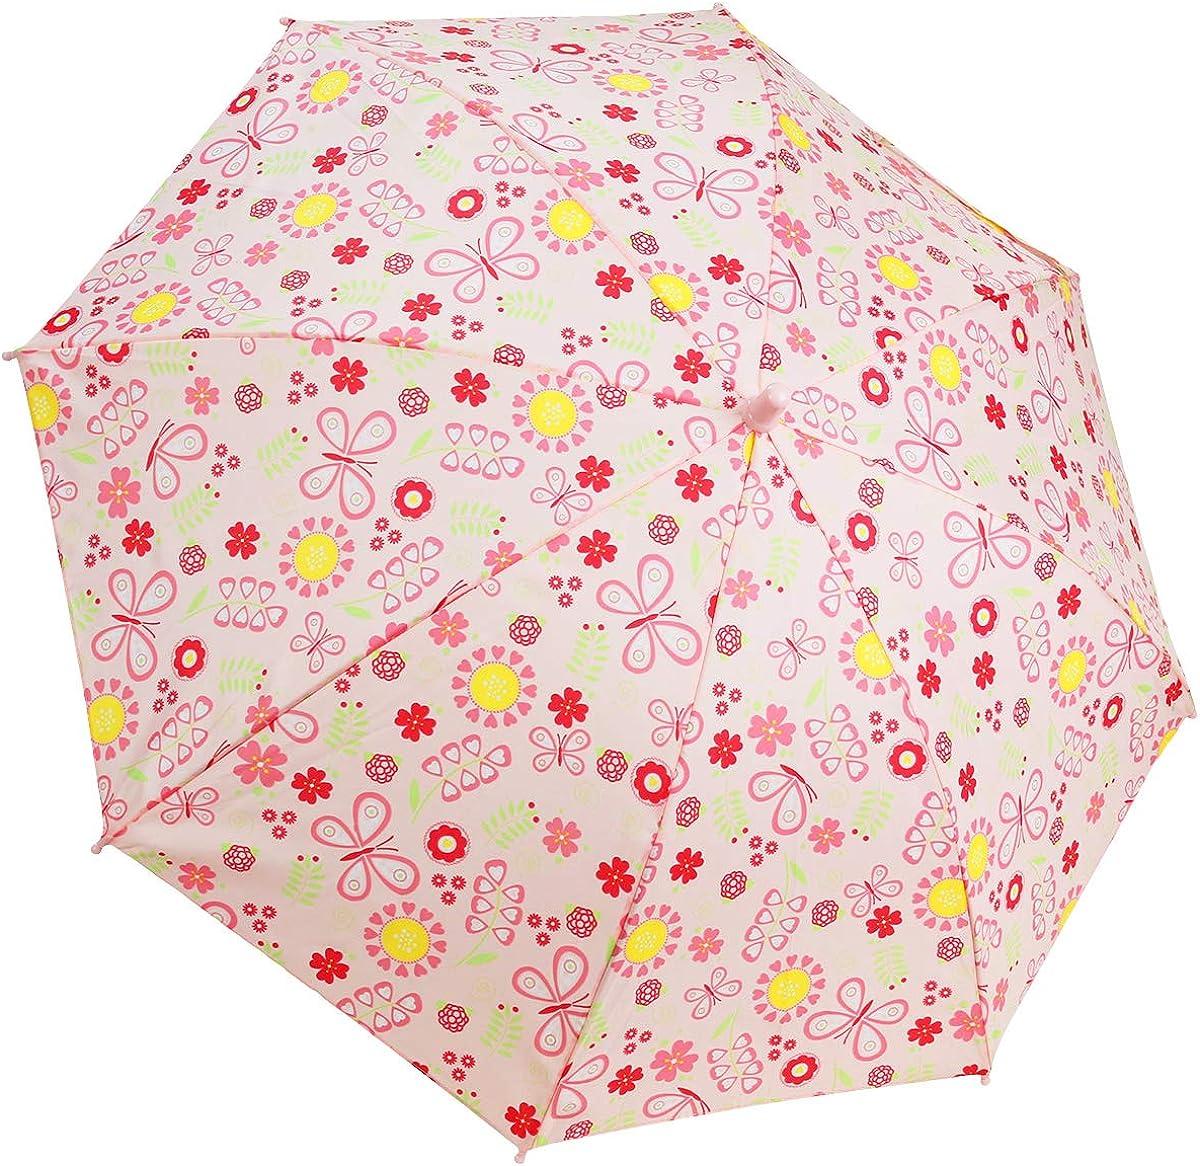 Neuser Kinder Schultaschenschirm Regenschirm Taschen Schirm Kinderschirm 114 RF Dr